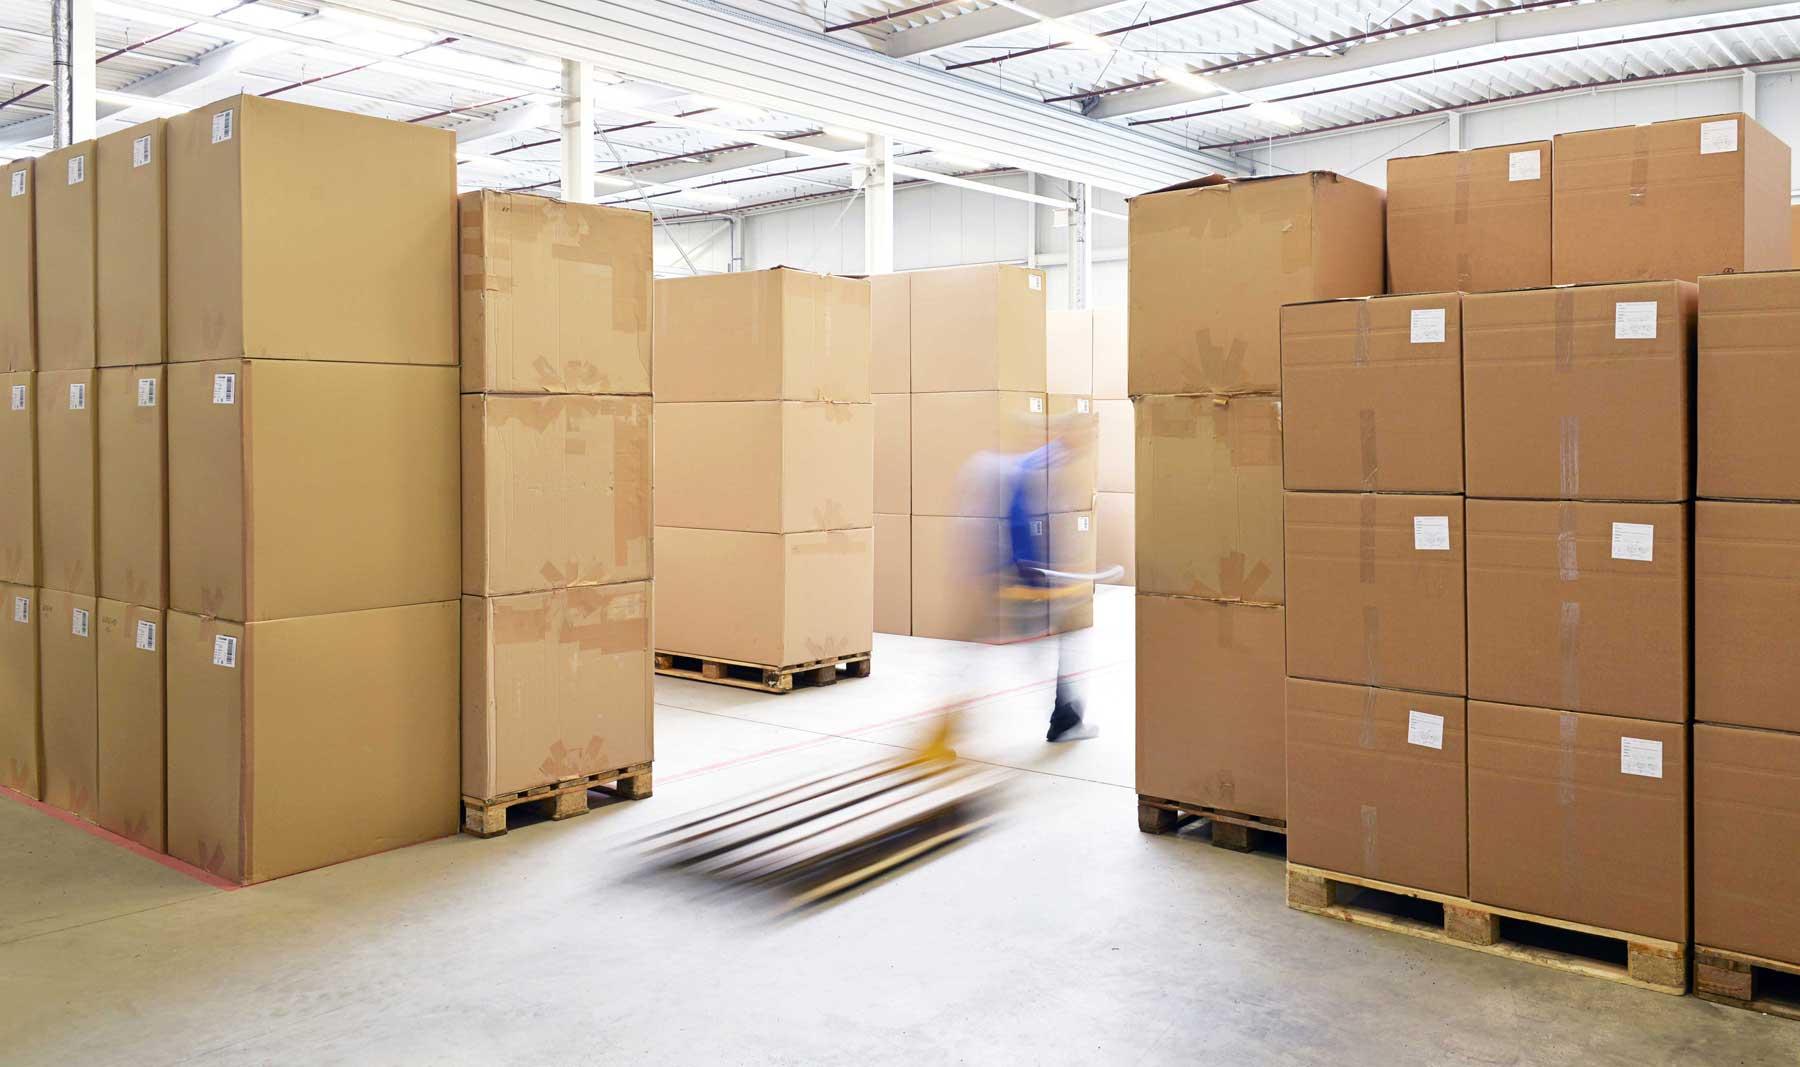 Matrix Removals Image of Self Storage in Surrey